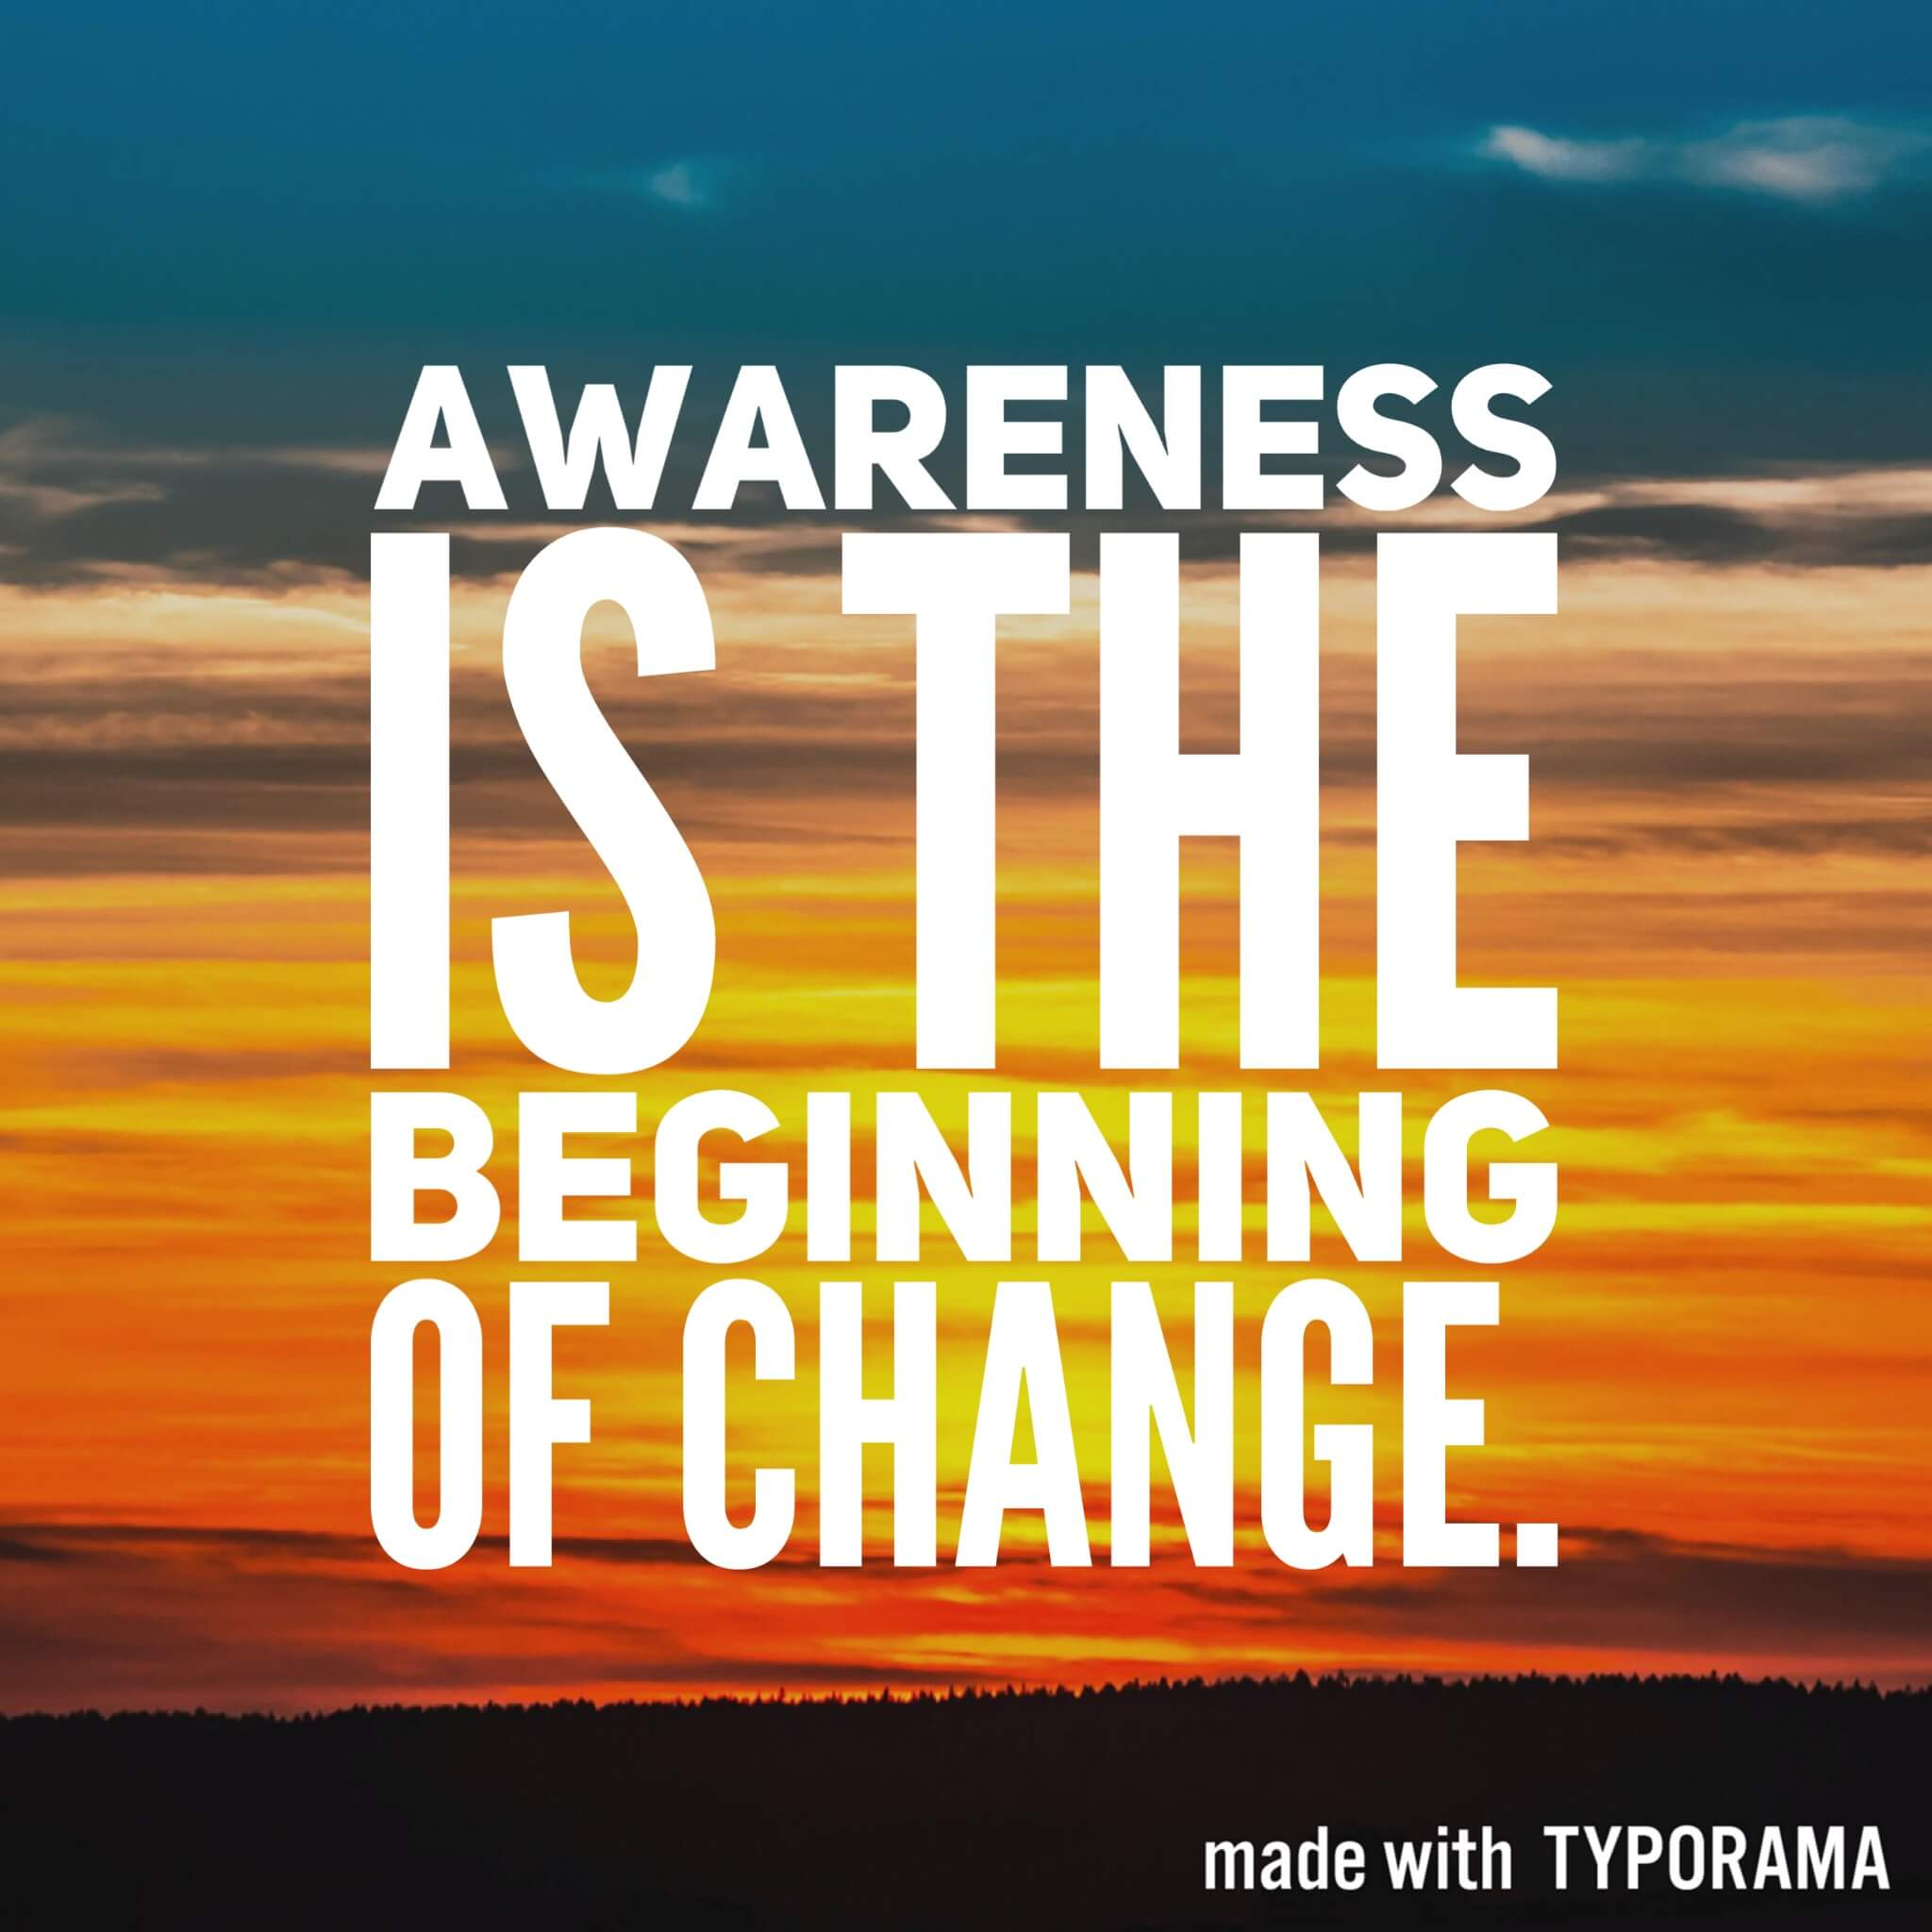 Awareness is the beginning of change.